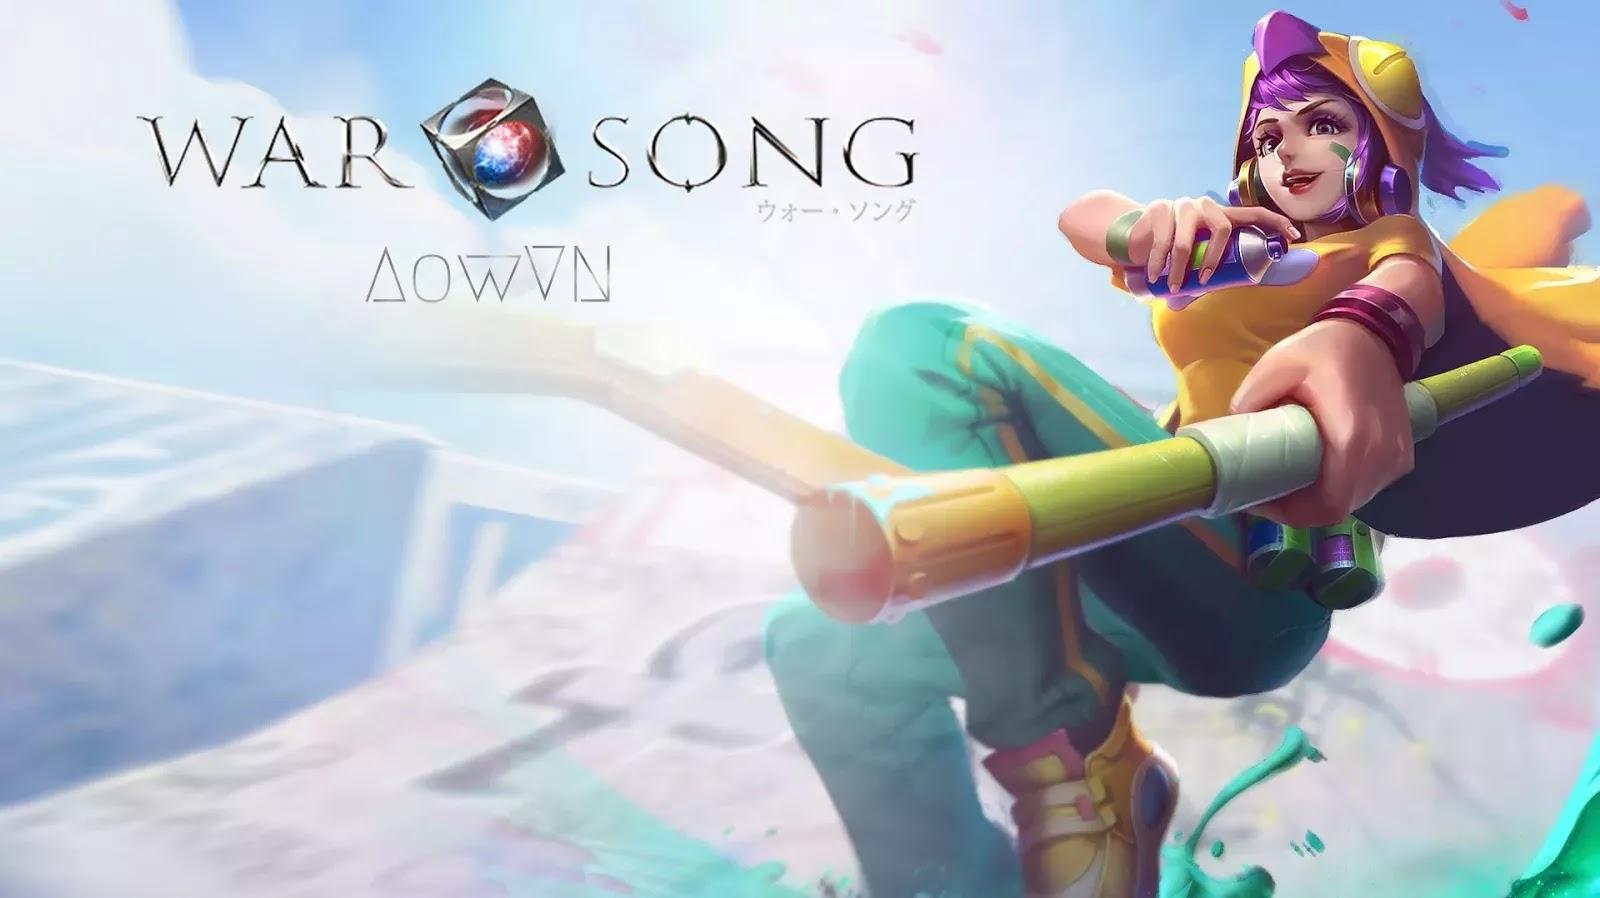 AowVN.org min WarSong%2B%252811%2529 - War Song - Thông Tin Về Game - Game Info